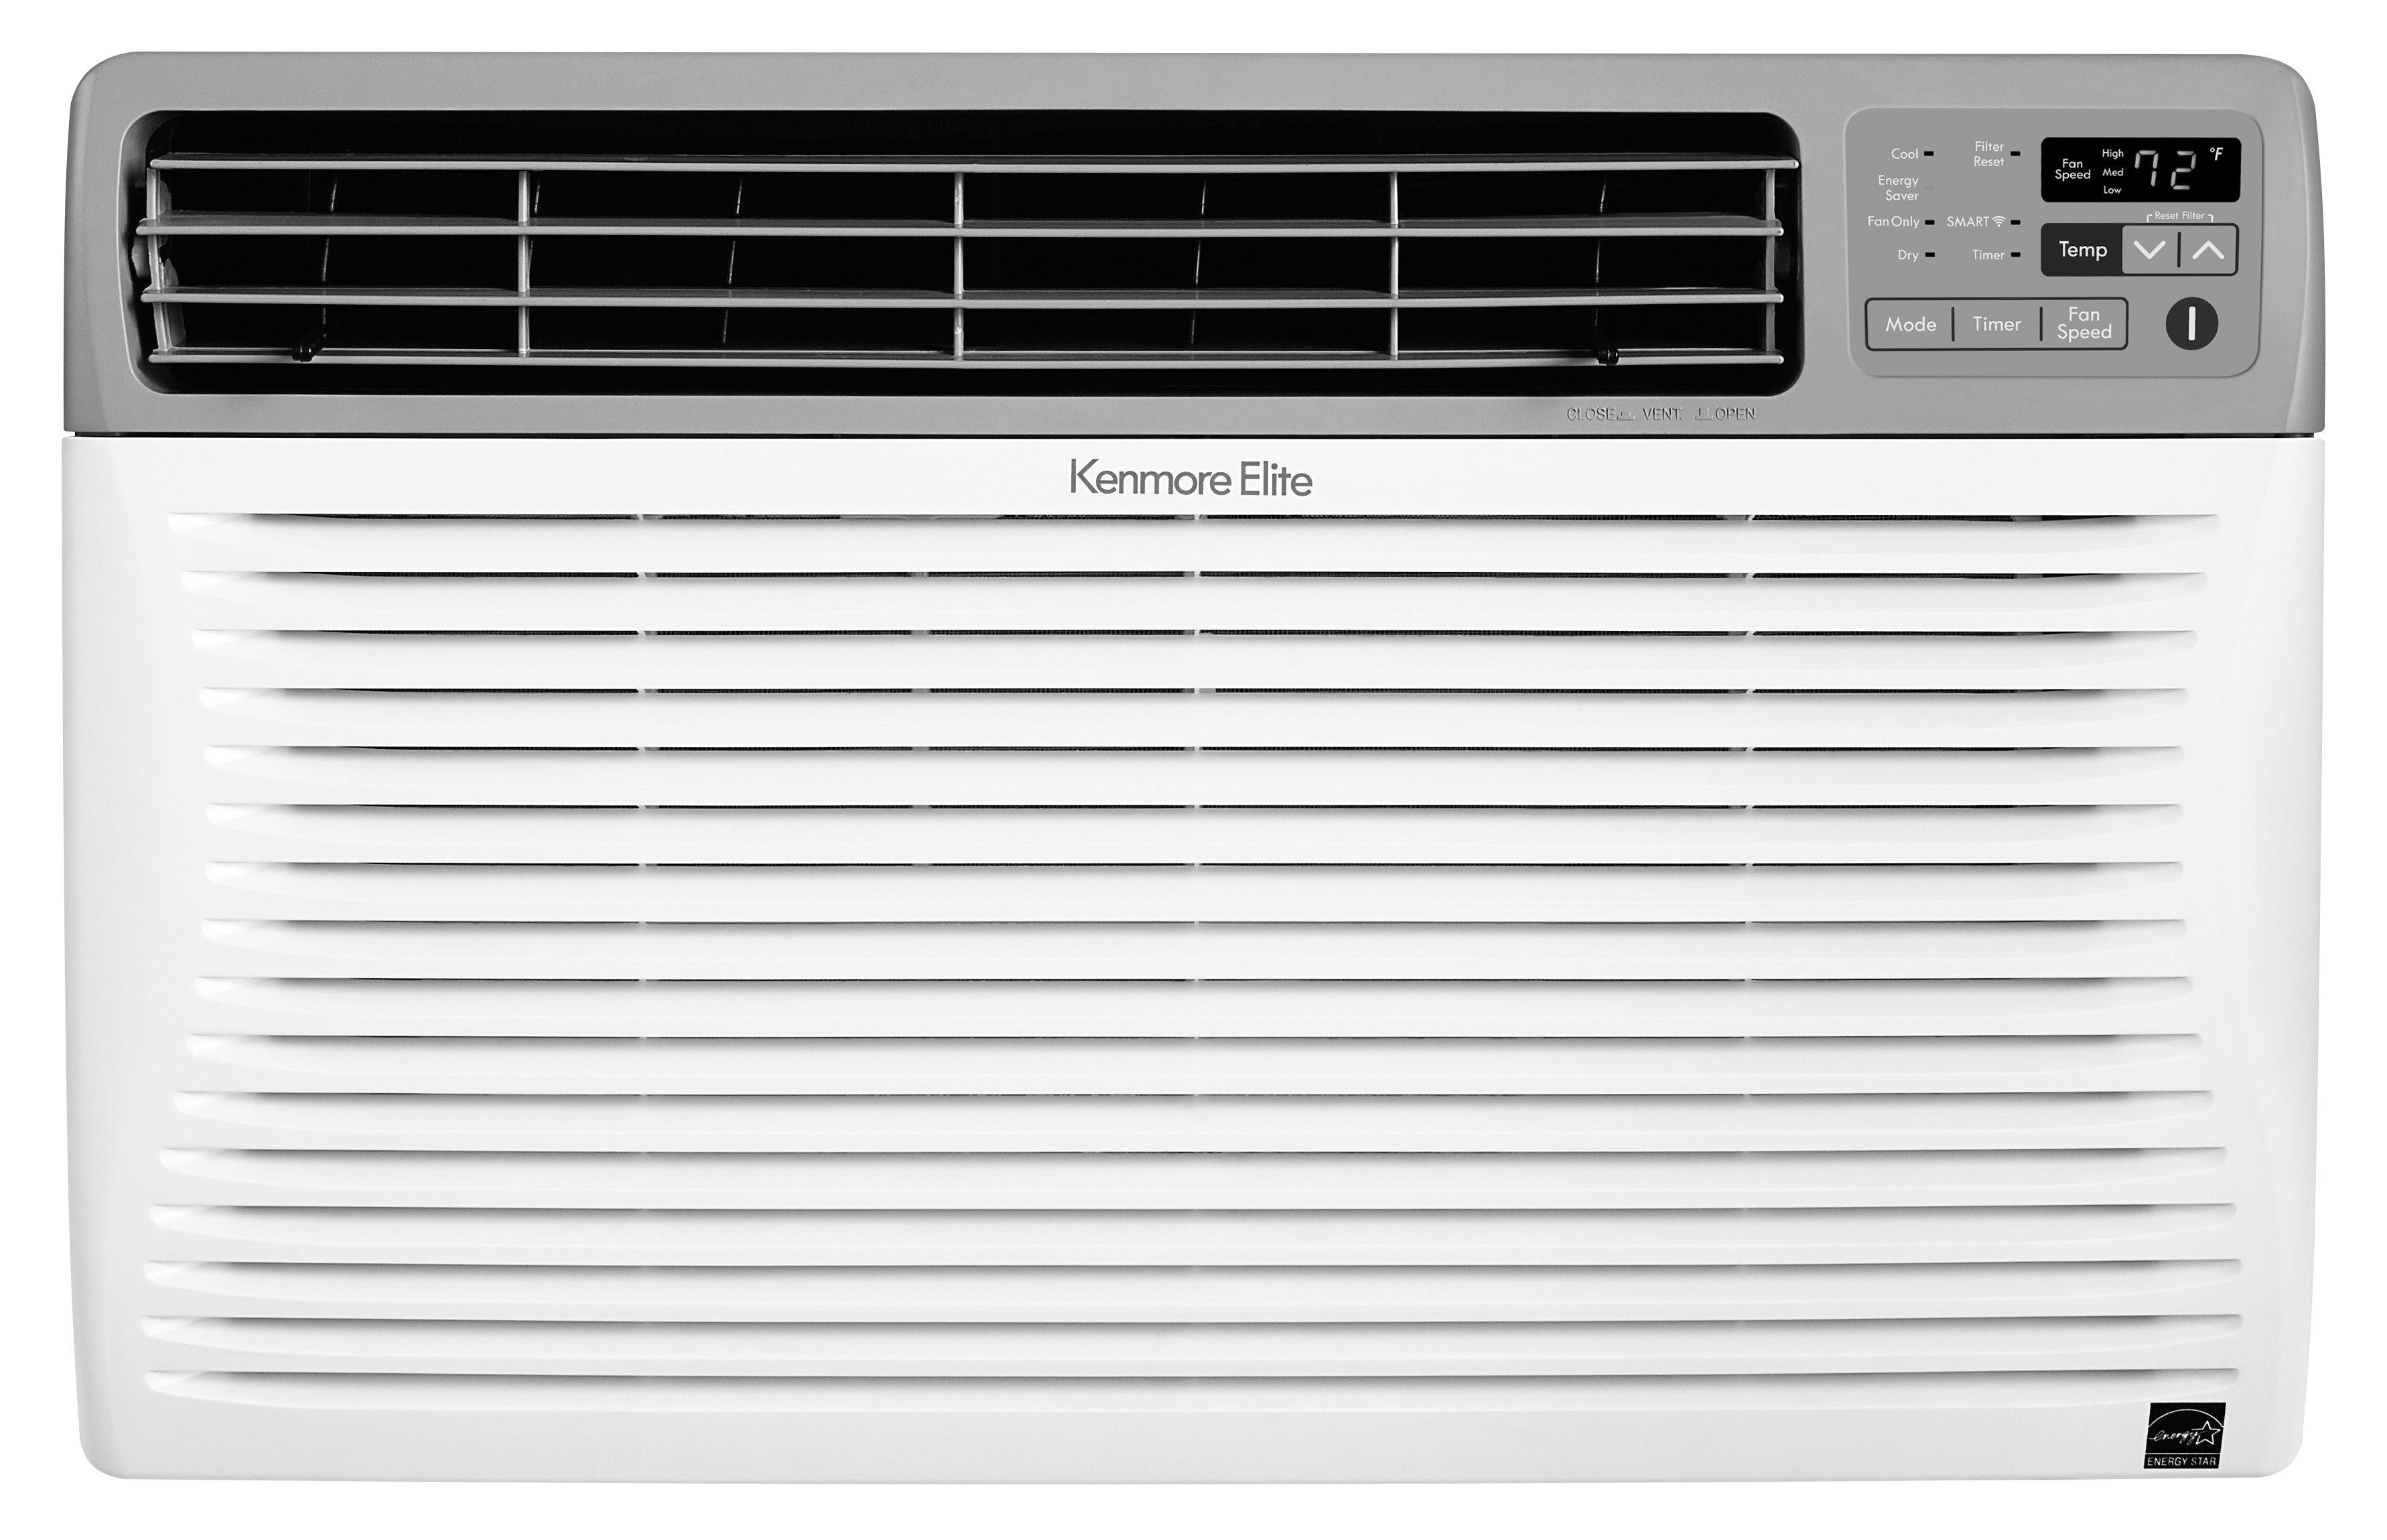 Kenmore Elite 77107 10 000 Btu Smart Room Air Conditioner Window Air Conditioner Best Window Air Conditioner Window Accessories